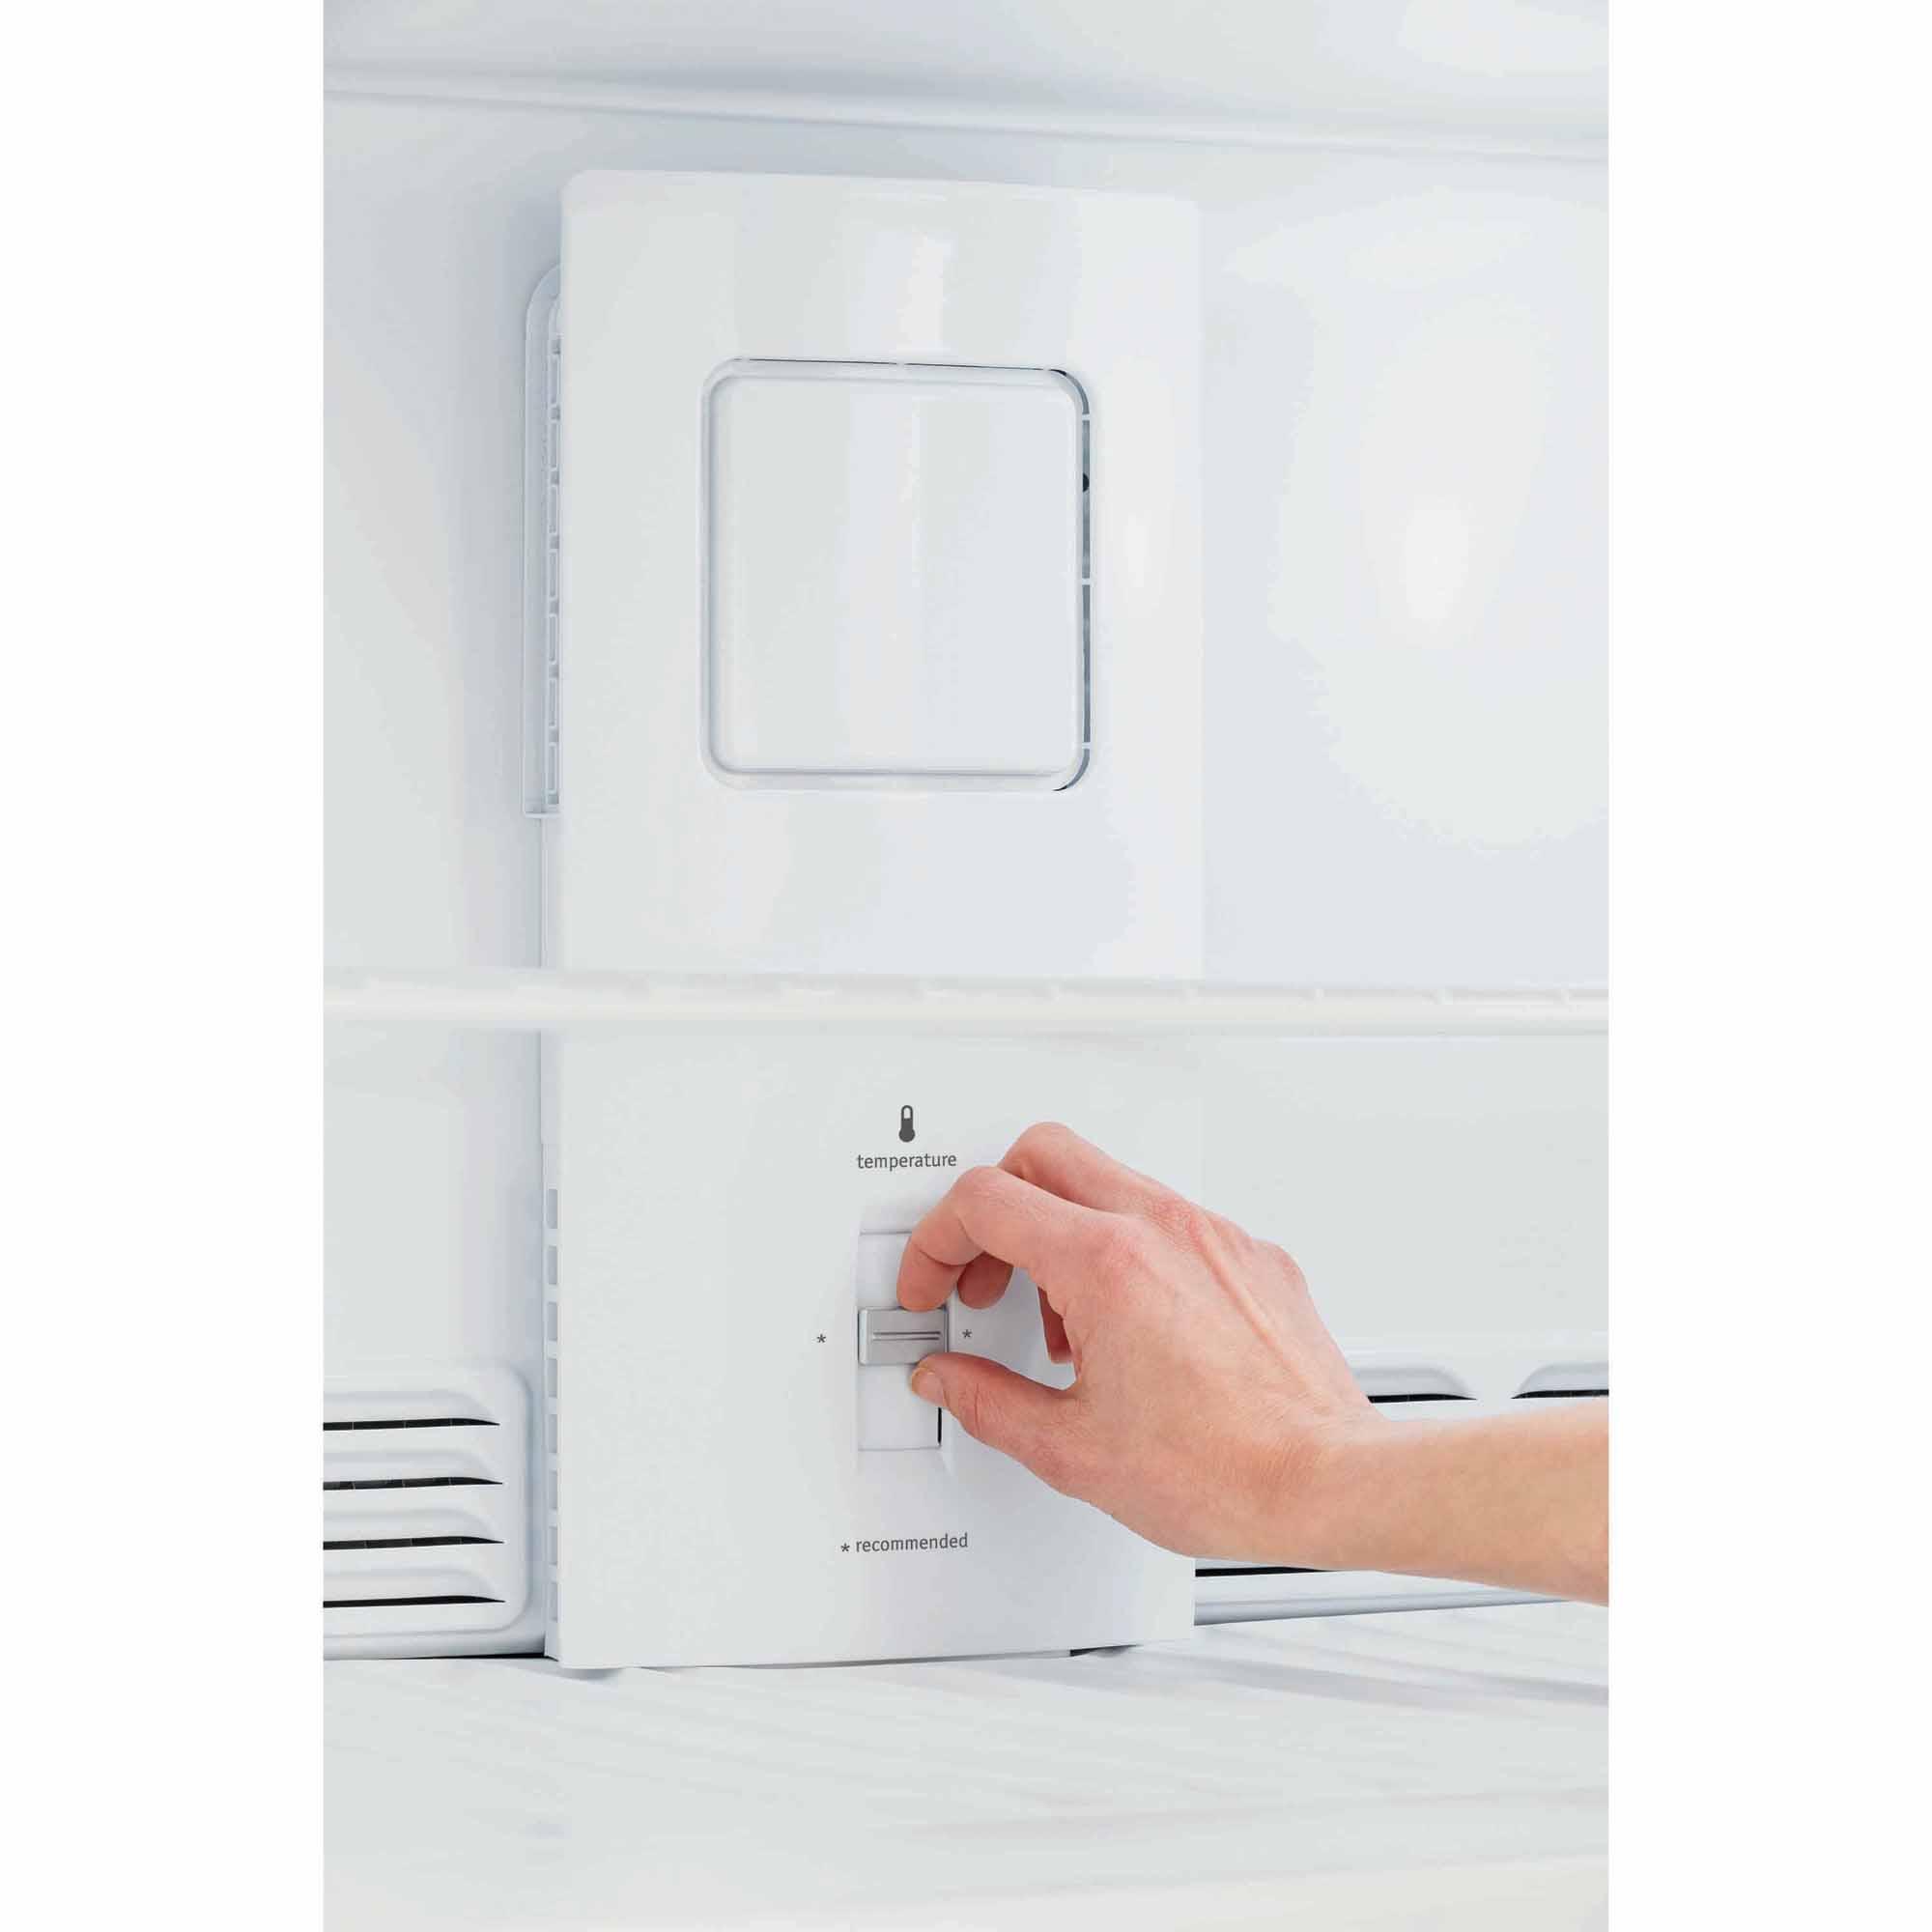 Frigidaire FFHT2131QE 20.5 cu. ft. Top Freezer Refrigerator - Black